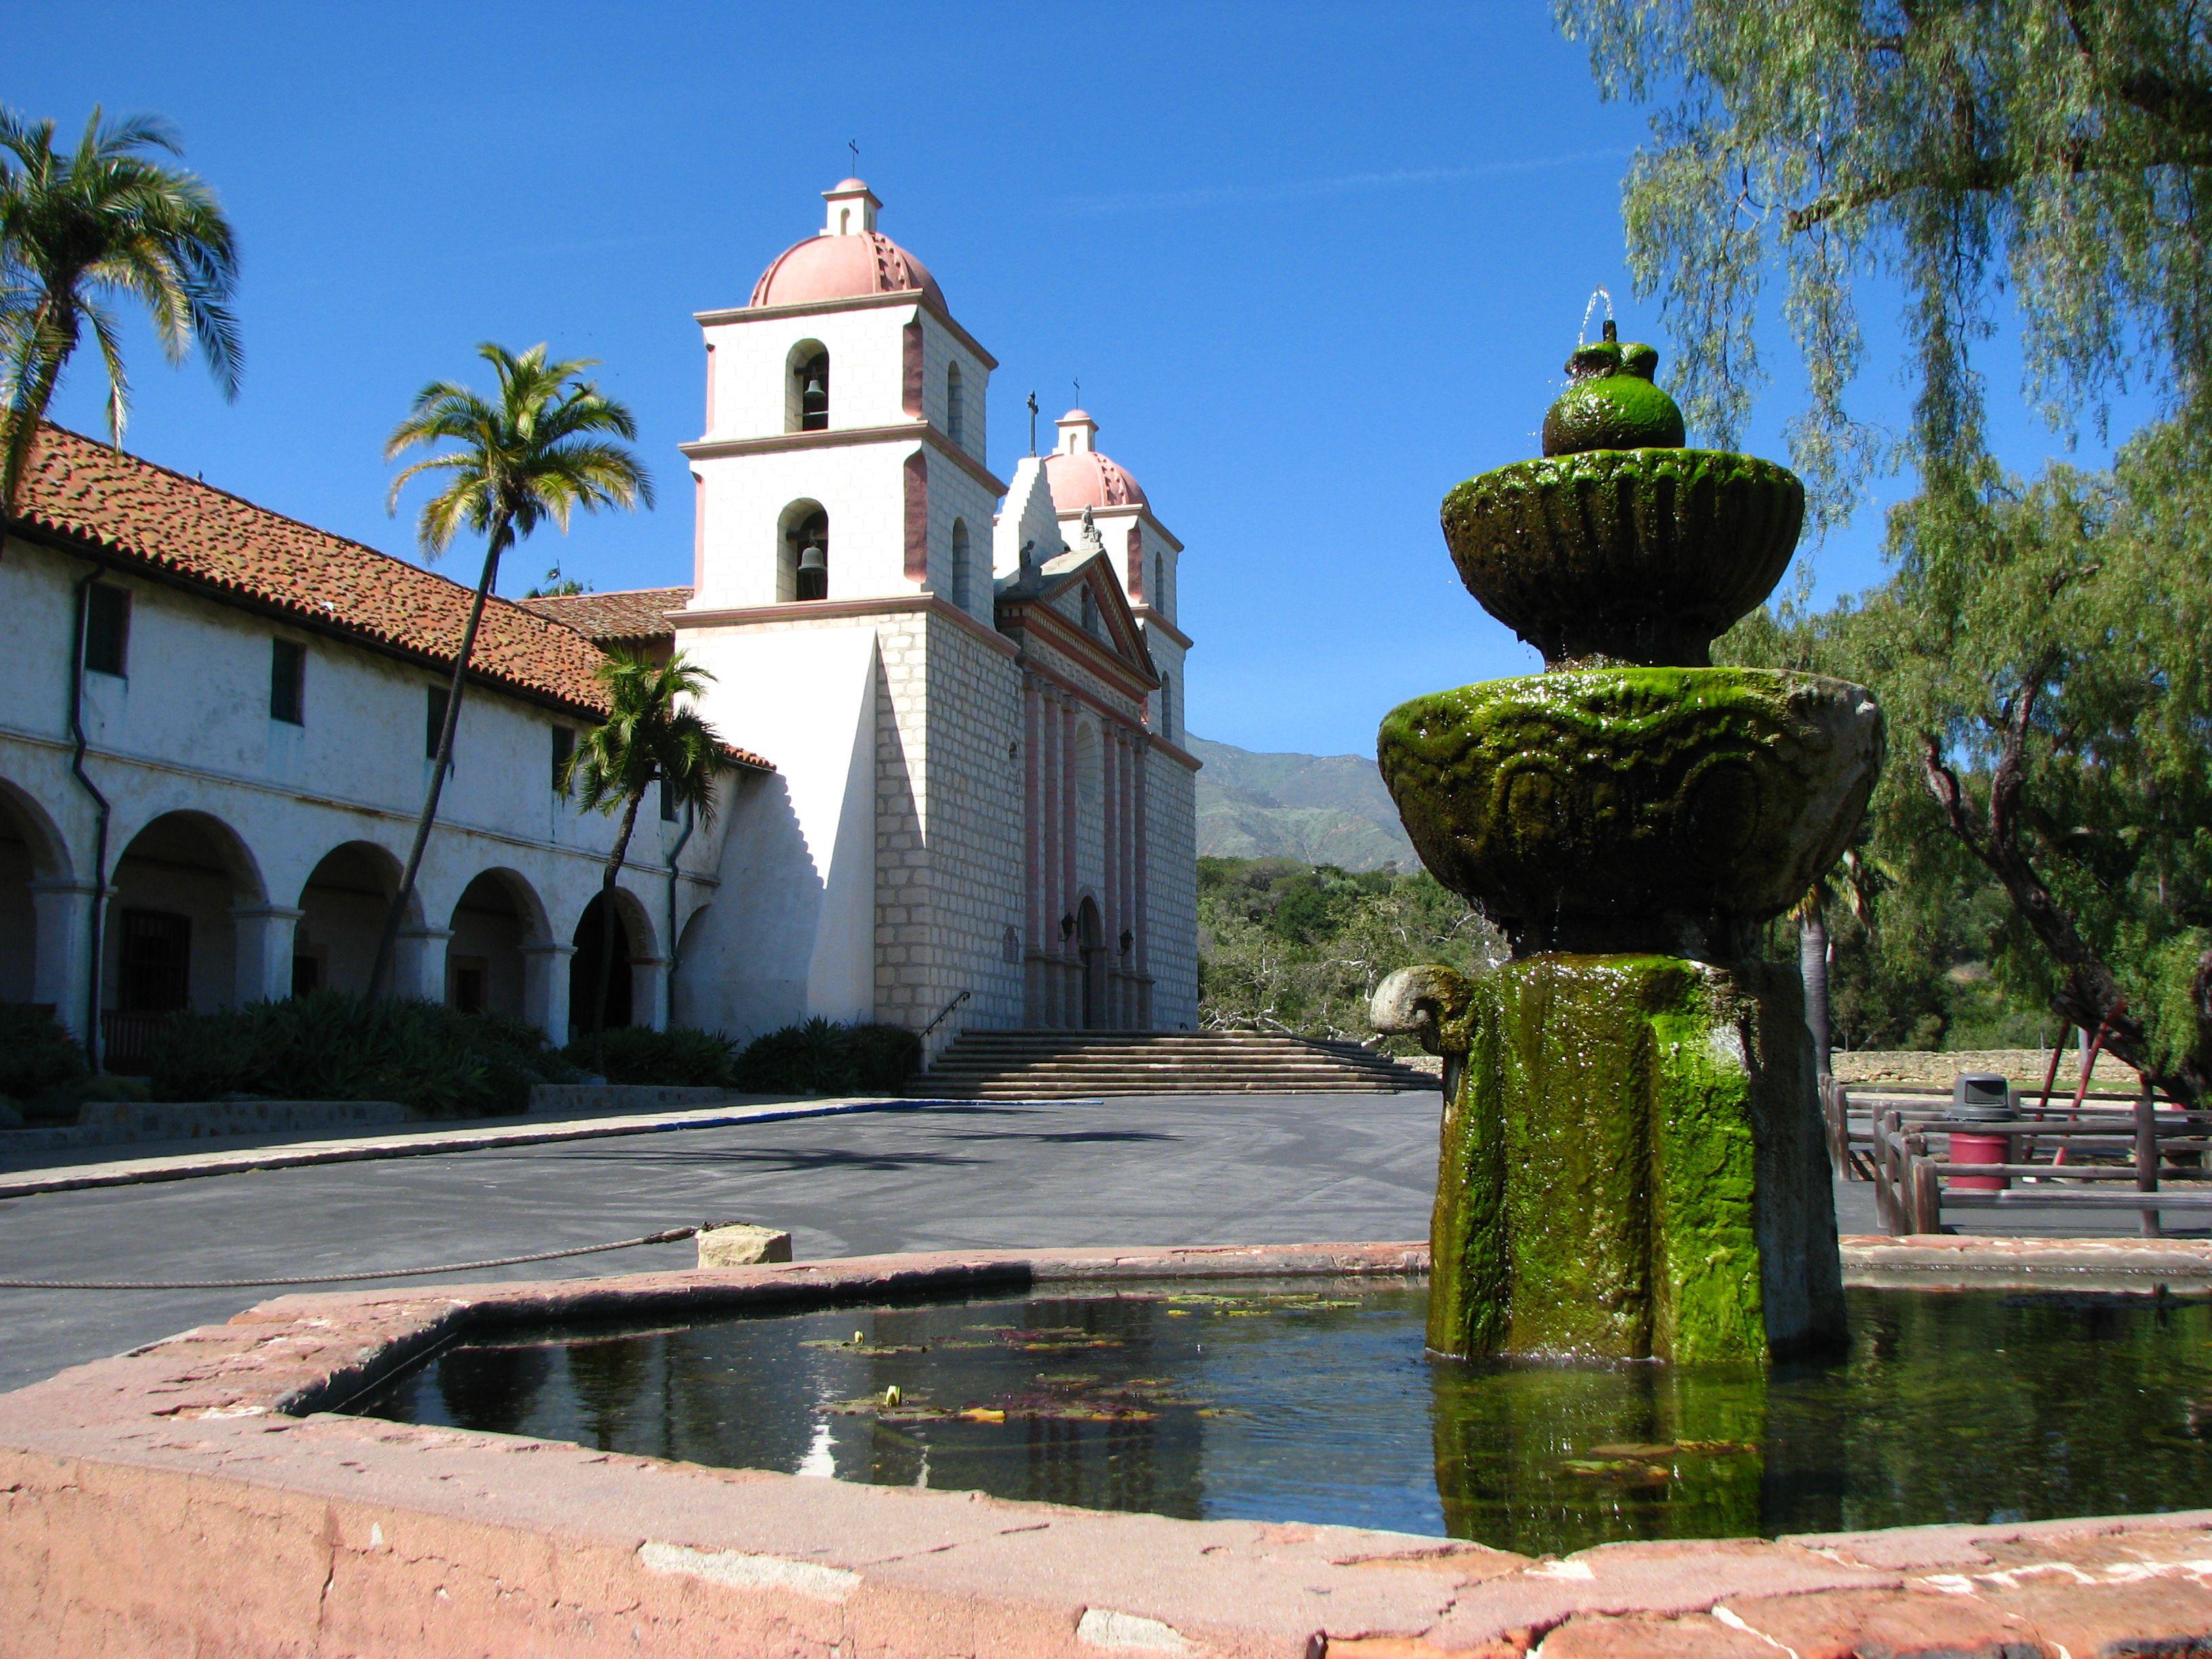 50 Things to Do in Santa Barbara California, Bucket List